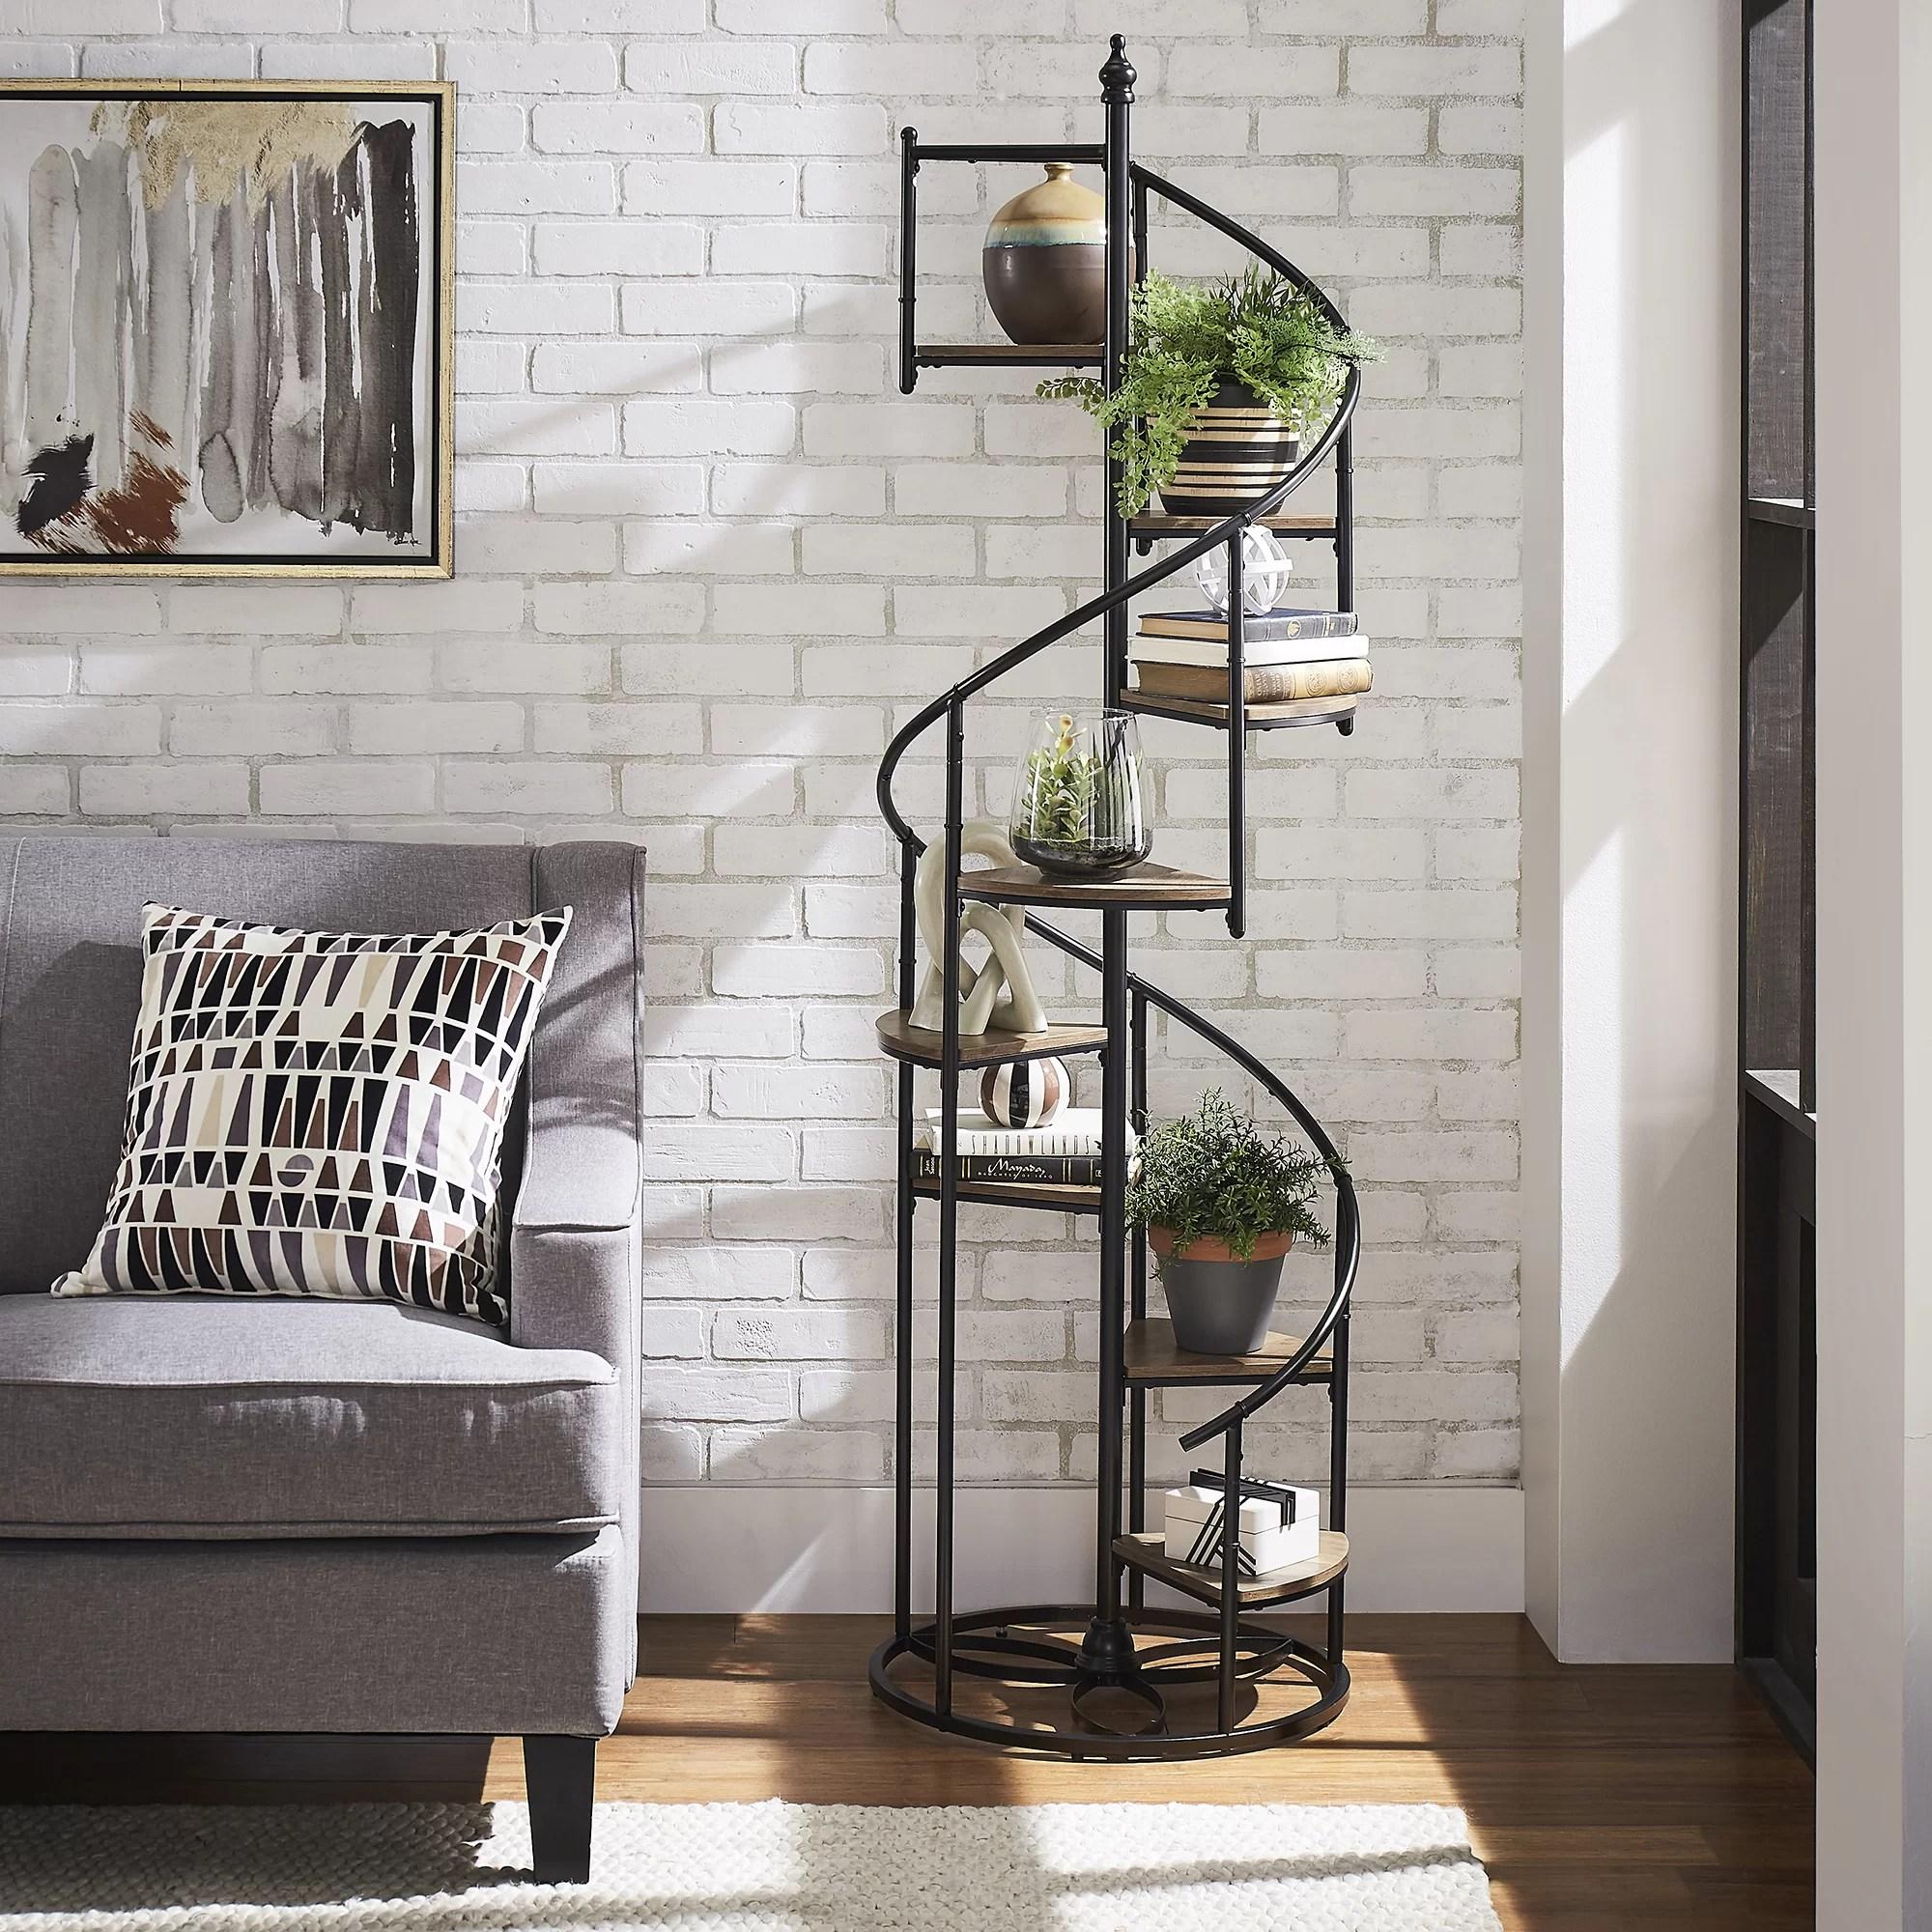 Red Barrel Studio Saear 69 H X 20 W Metal Spiral Staircase Display Shelf Reviews Wayfair